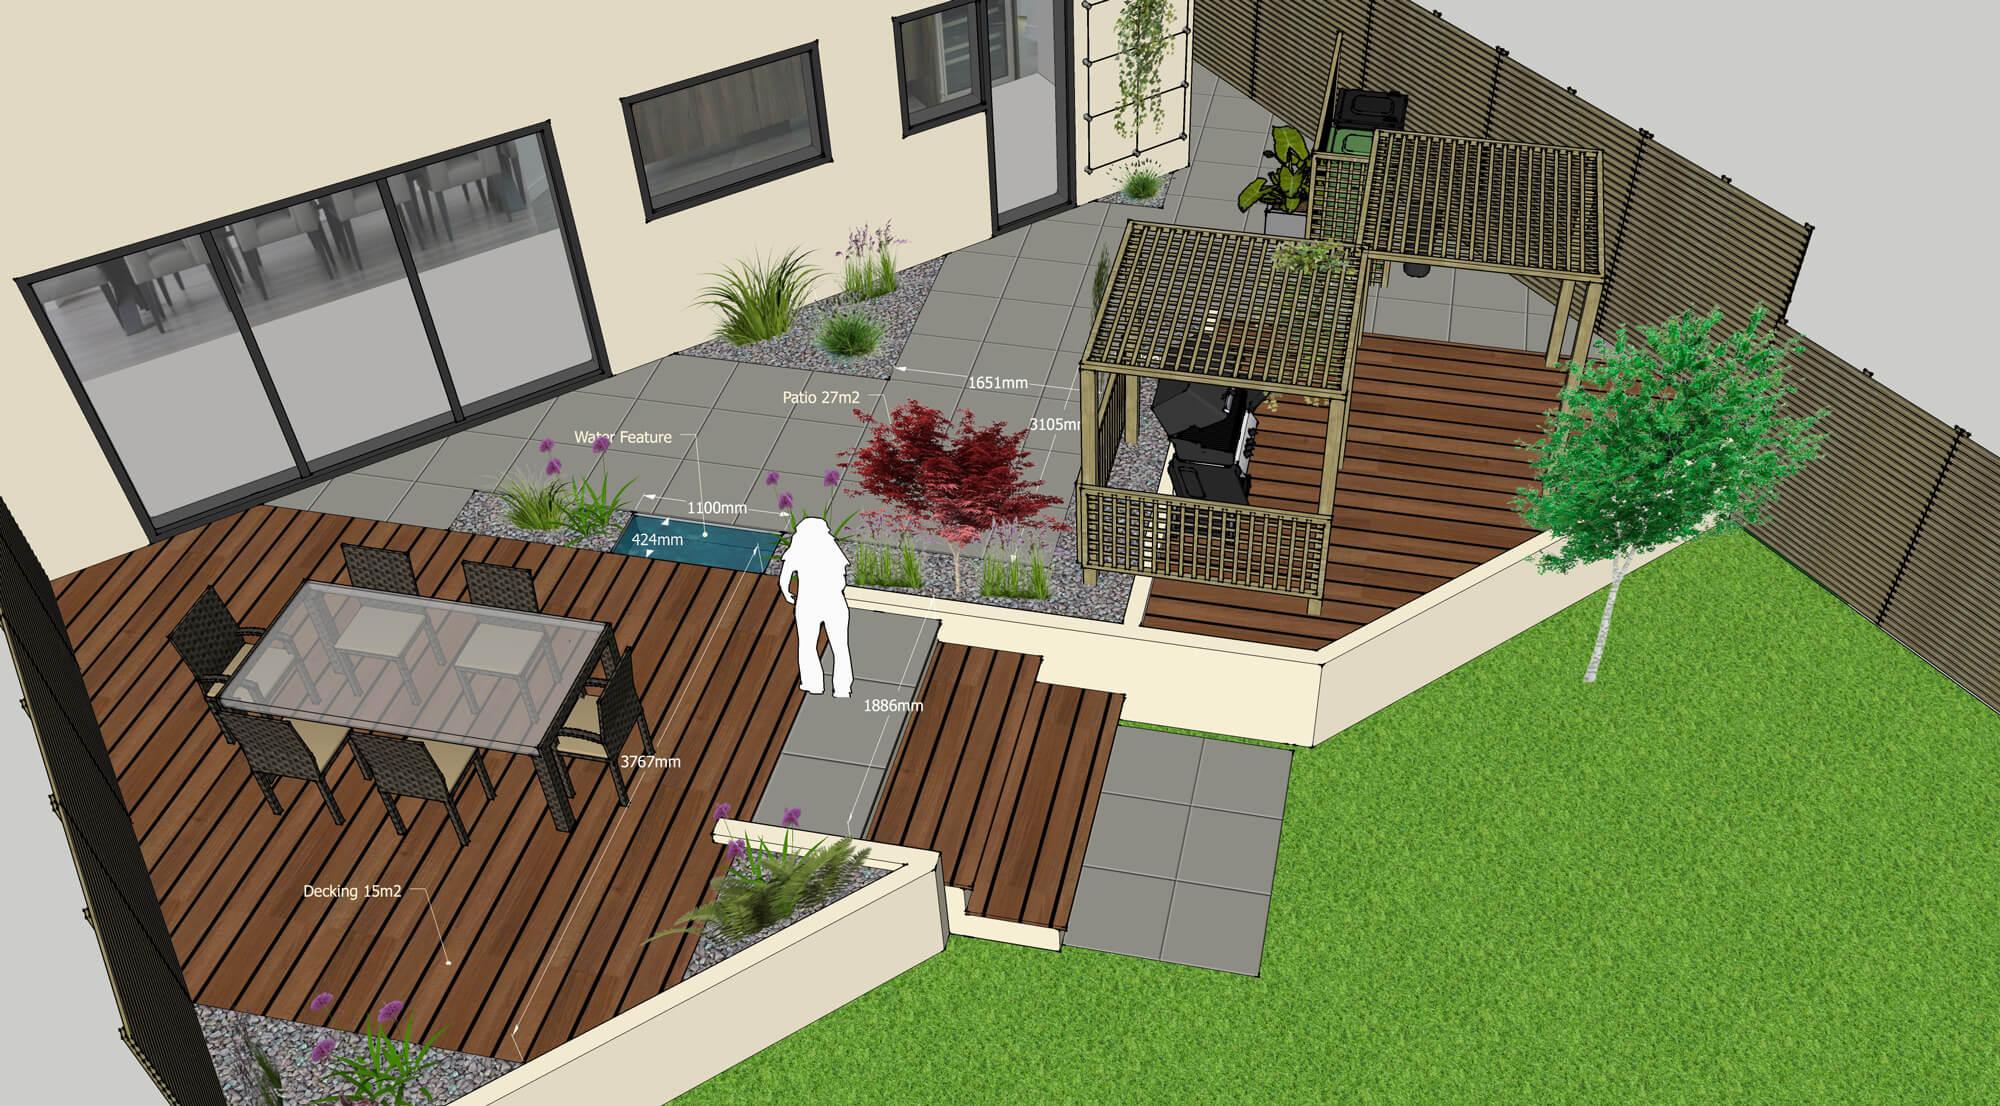 New Build Home The Blank Canvas Garden Design Concepts